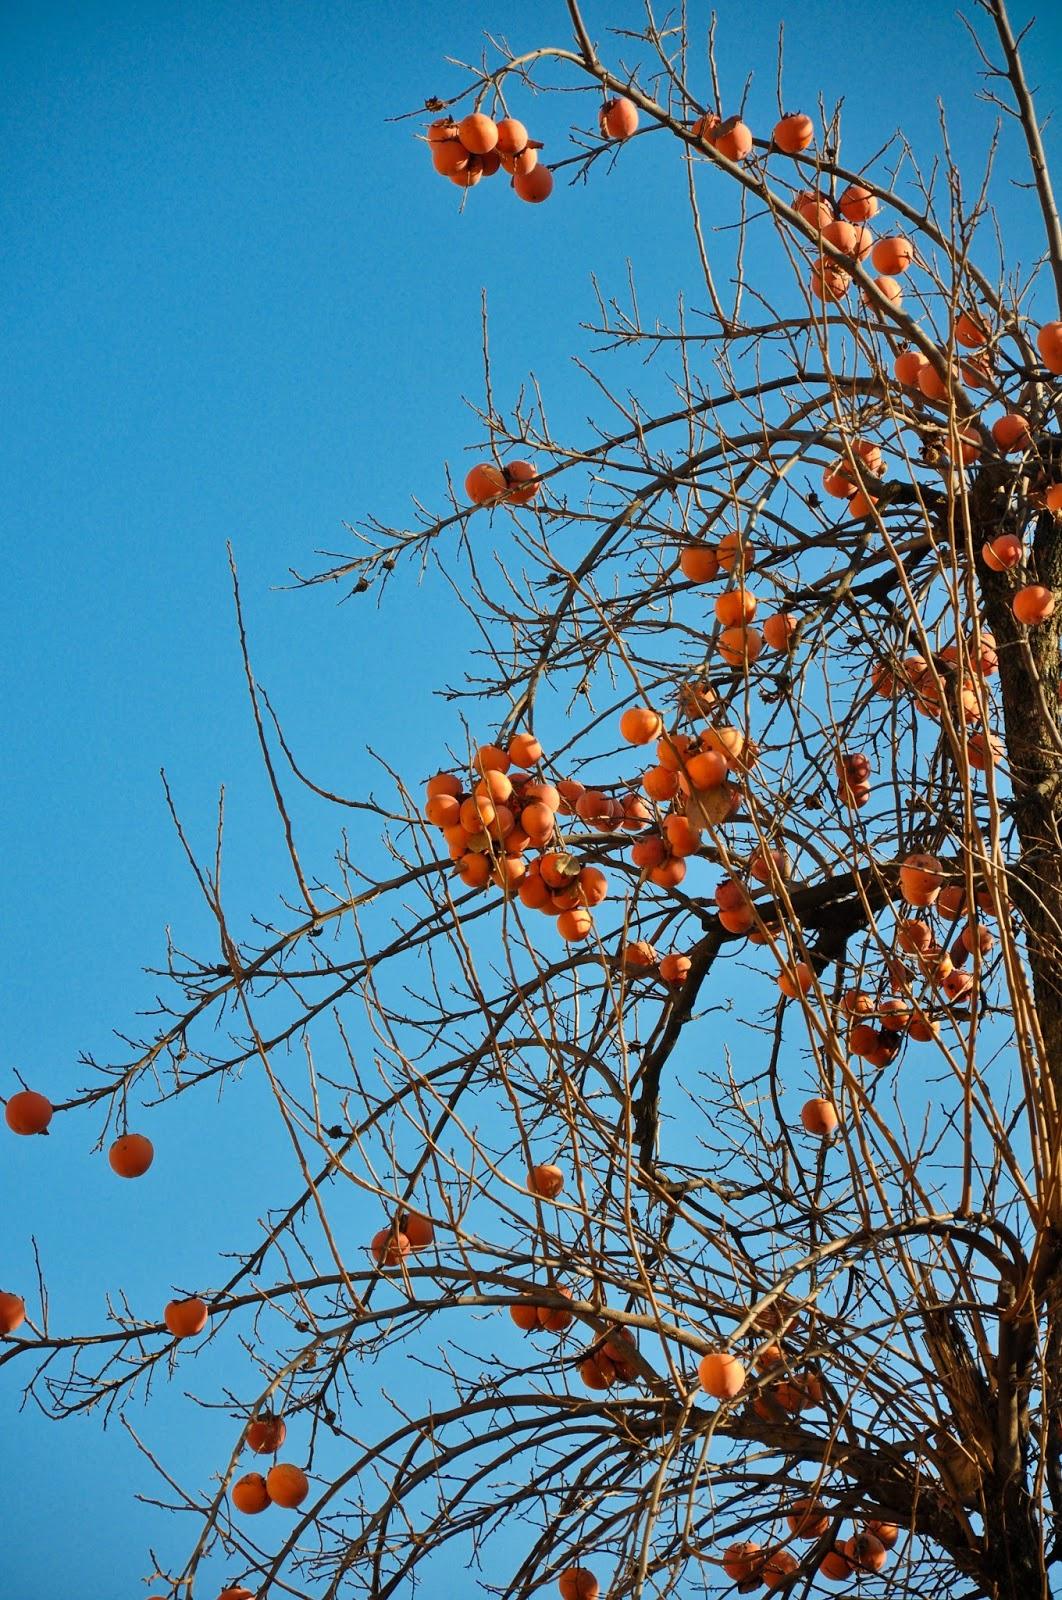 Persimmon tree, Vicenza, Italy